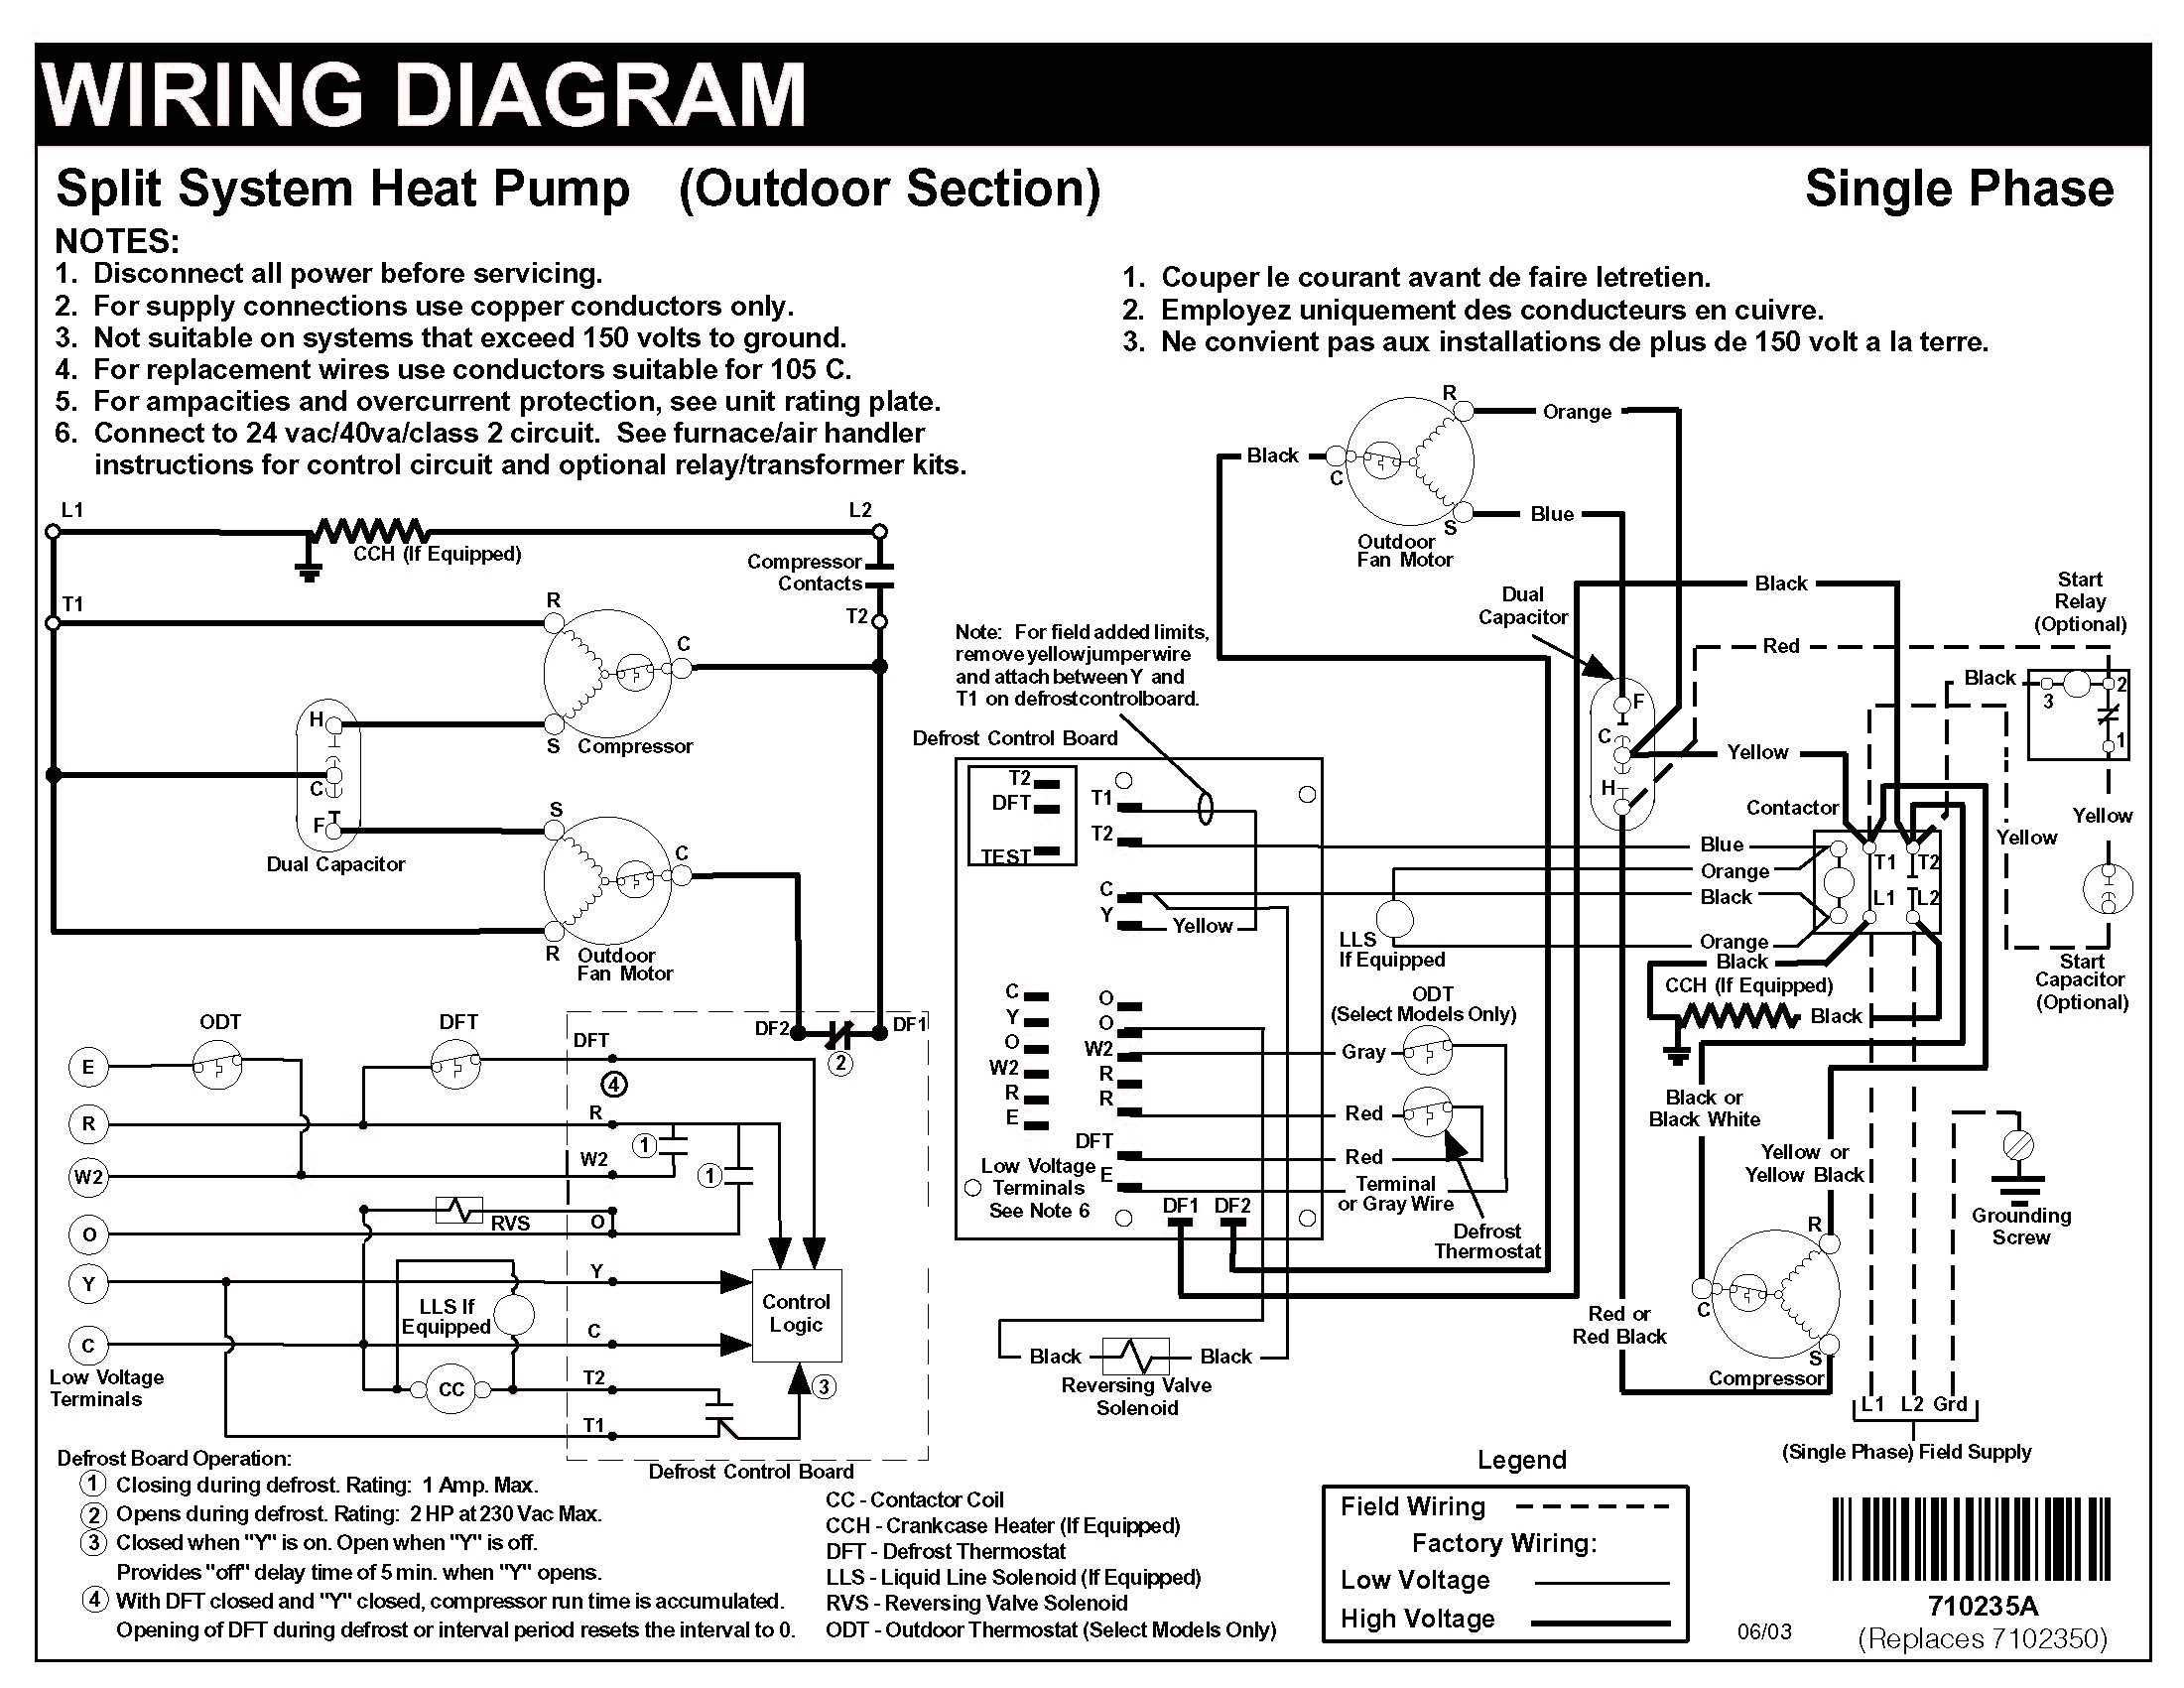 Trane Xl 1200 Wiring Diagram Lovely Hvac Training Schematic Diagrams Youtube Trane Ac Wiring Diagram